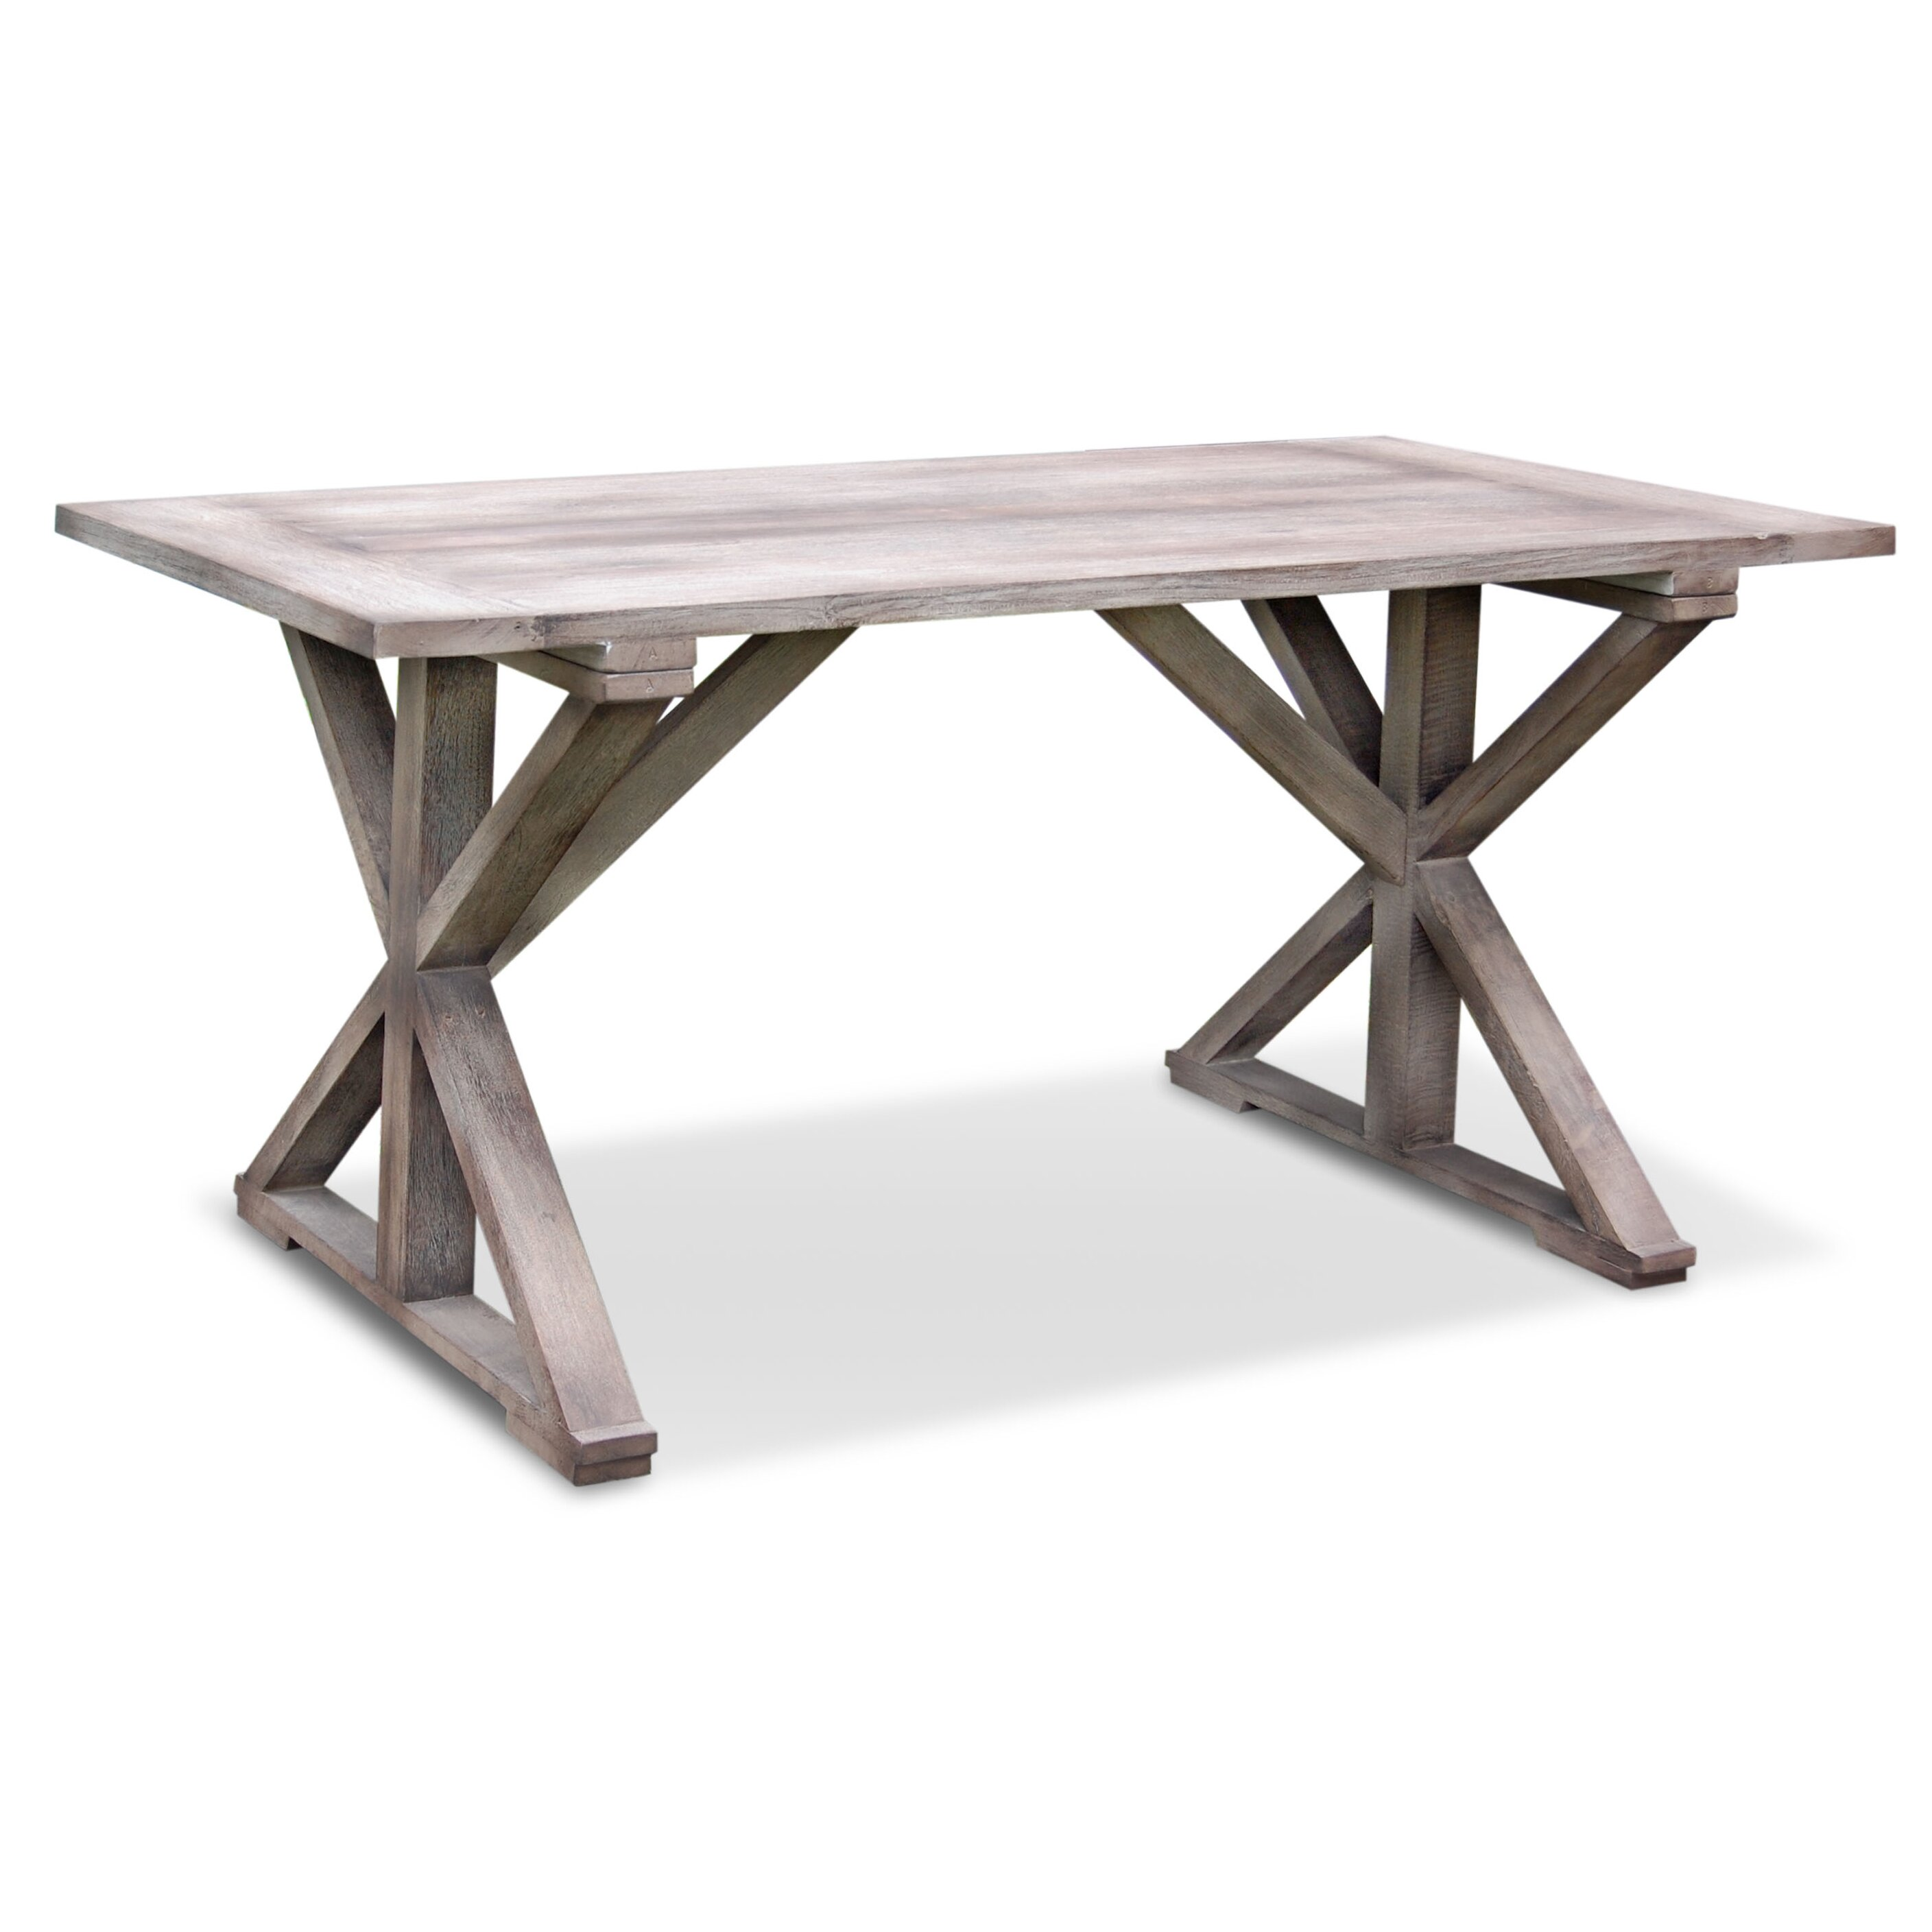 One Allium Way Lesperance Dining Table amp Reviews Wayfair : Meredith2BTeak2BDining2BTable from www.wayfair.com size 2817 x 2817 jpeg 435kB